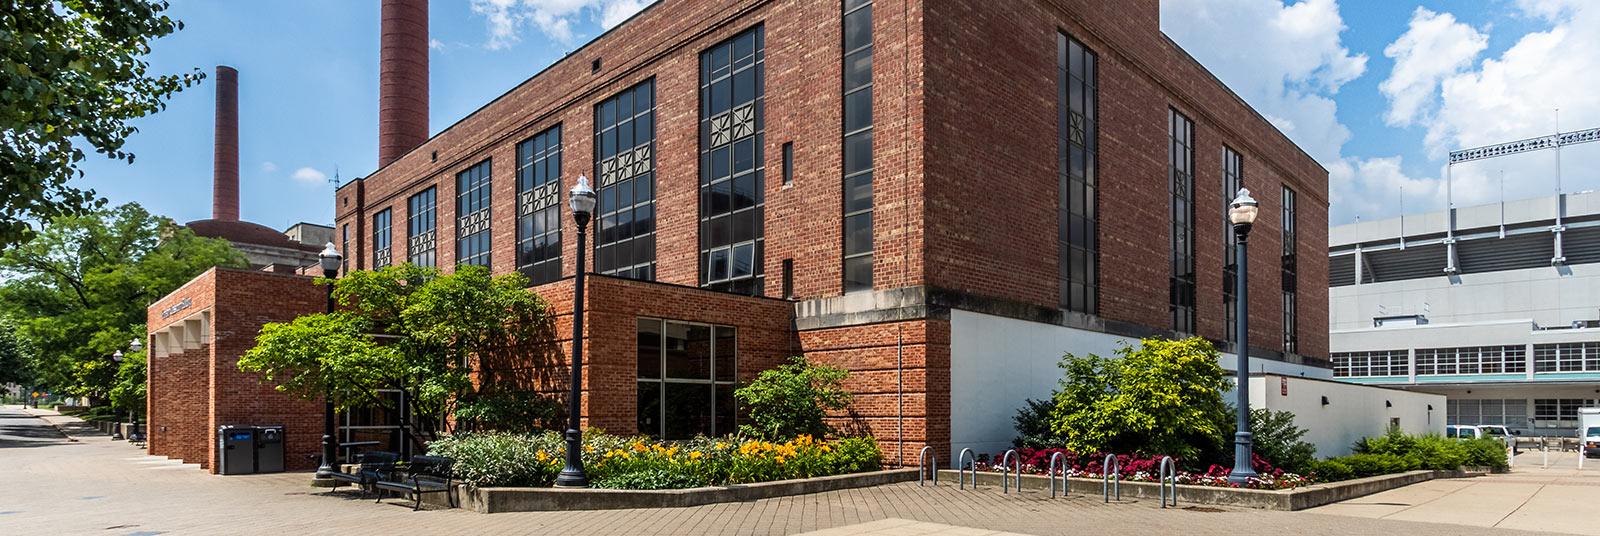 The updated OSU Enarson Hall in Columbus, Ohio